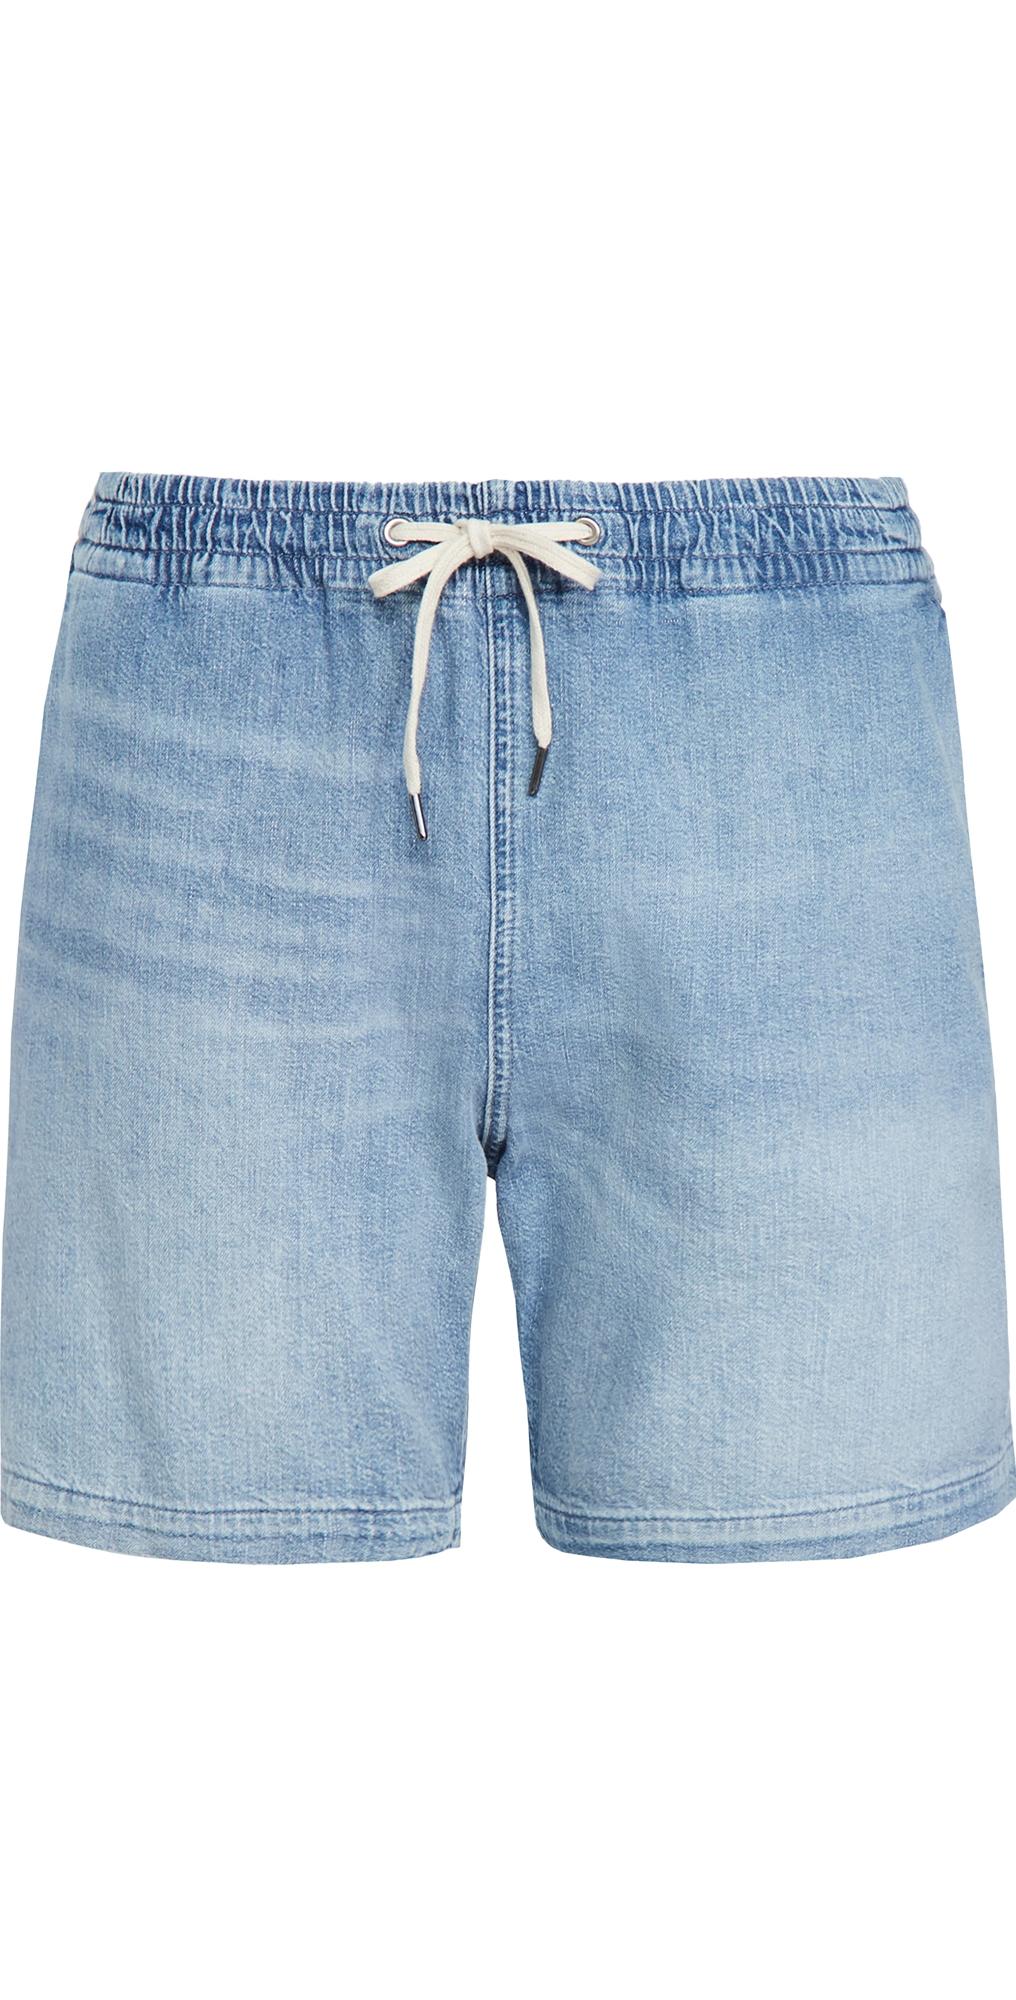 Polo Ralph Lauren Washed Denim Prepster Shorts